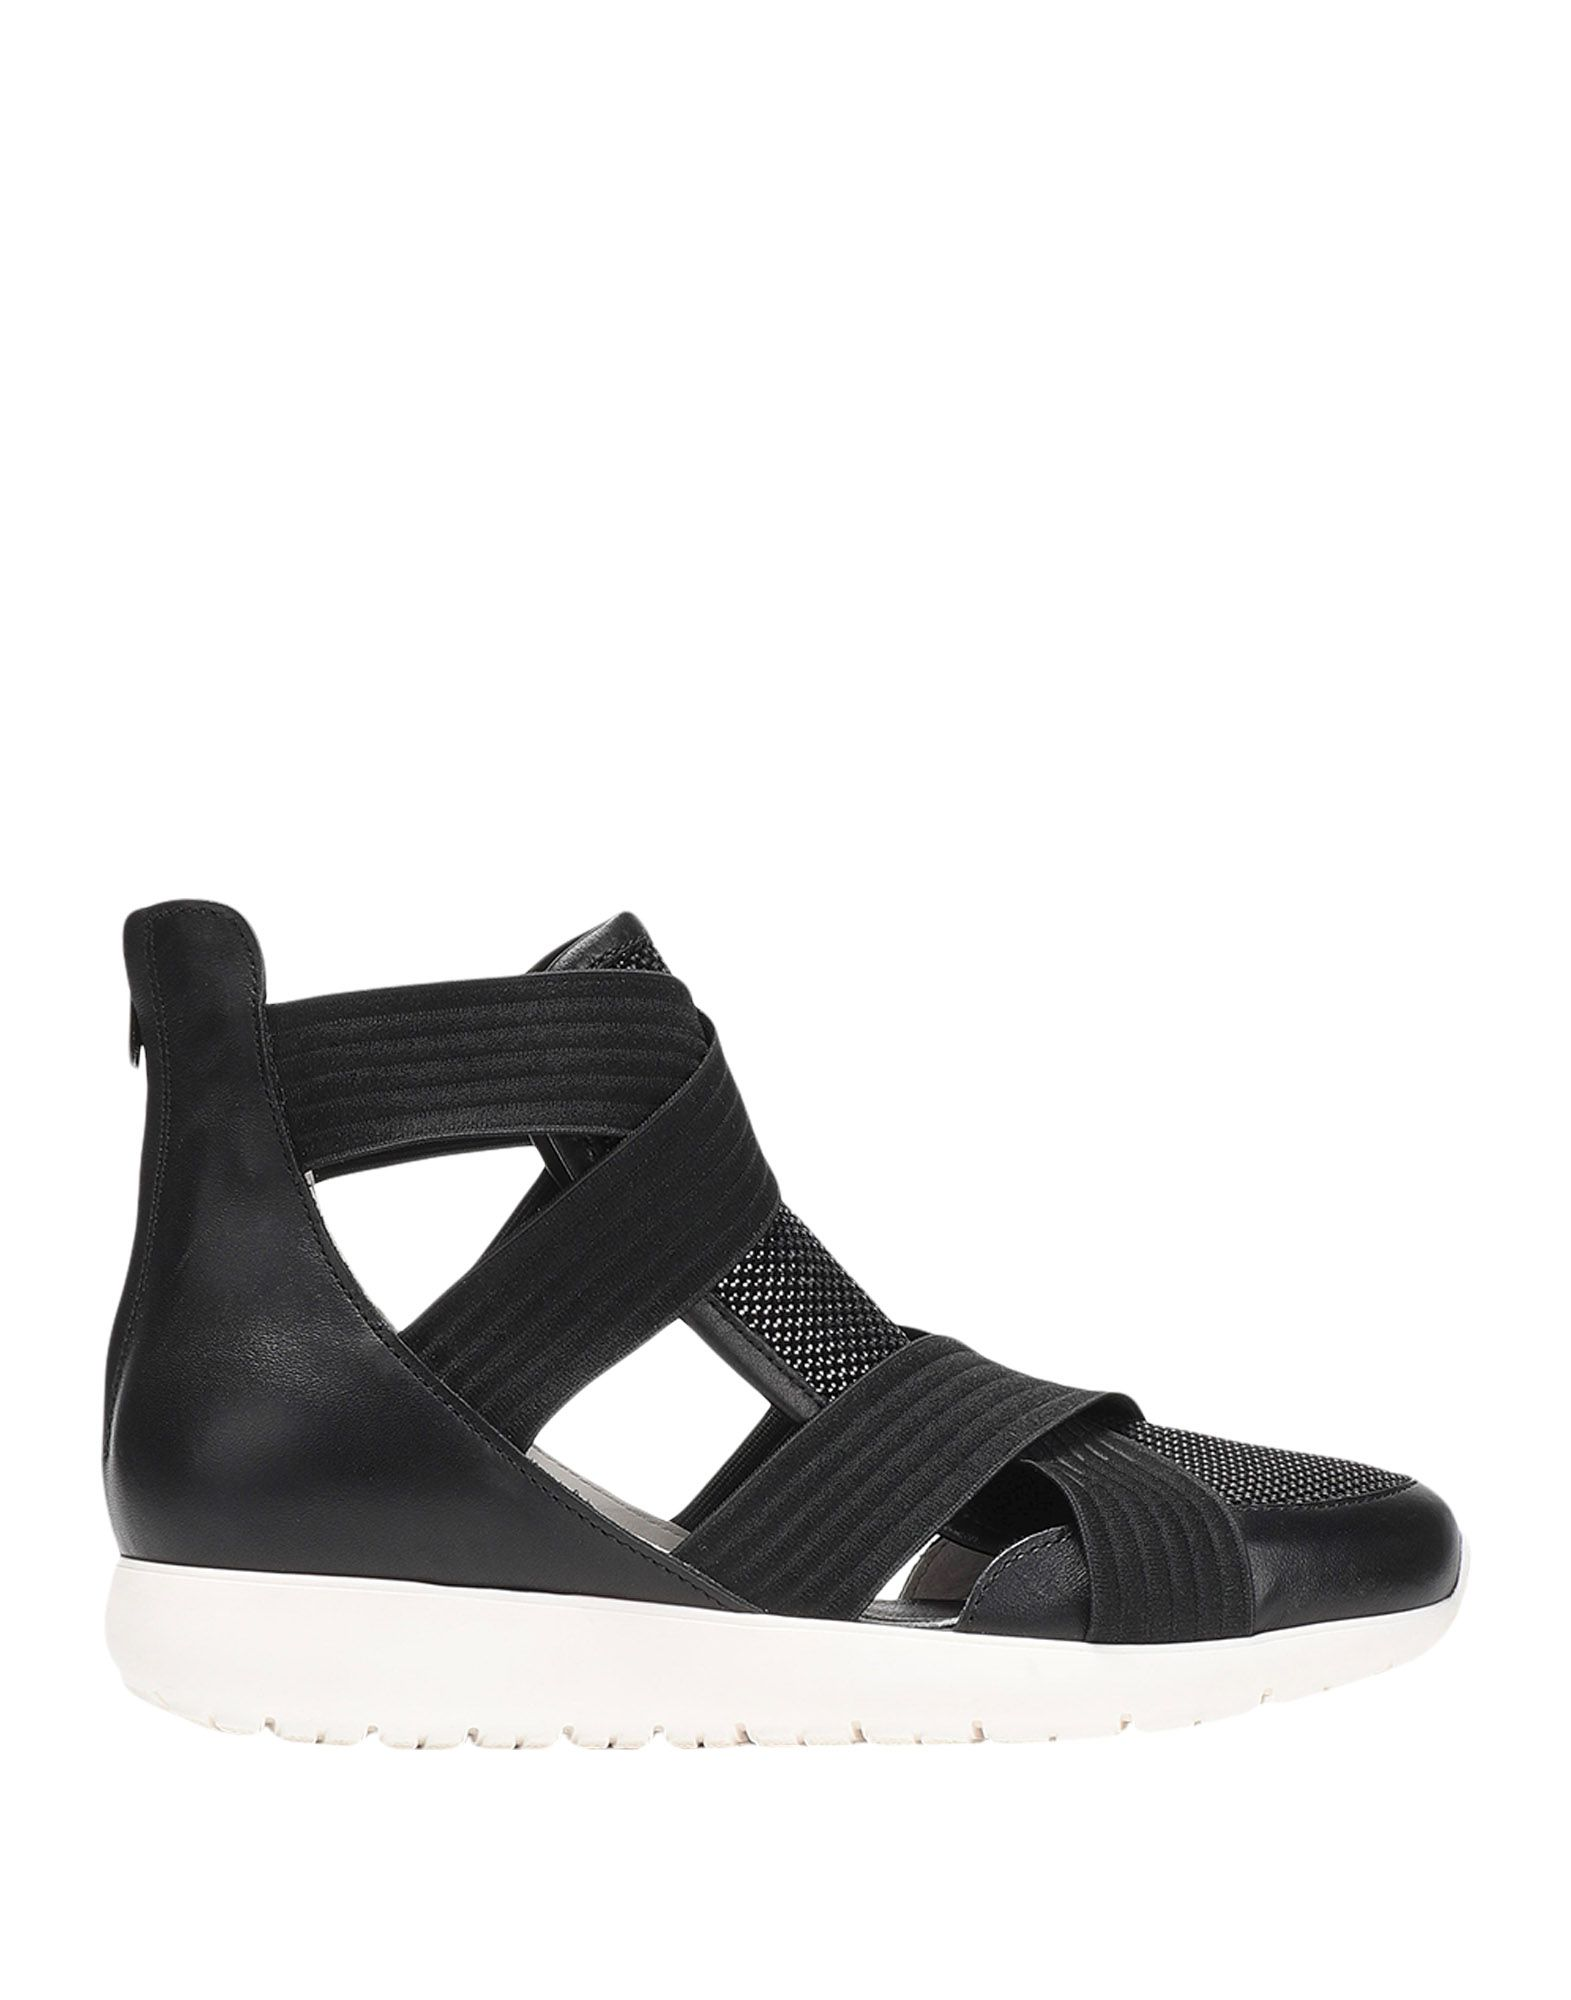 Andìa Fora Fora Sneakers - Women Andìa Fora Fora Sneakers online on  United Kingdom - 11565502JV da9699